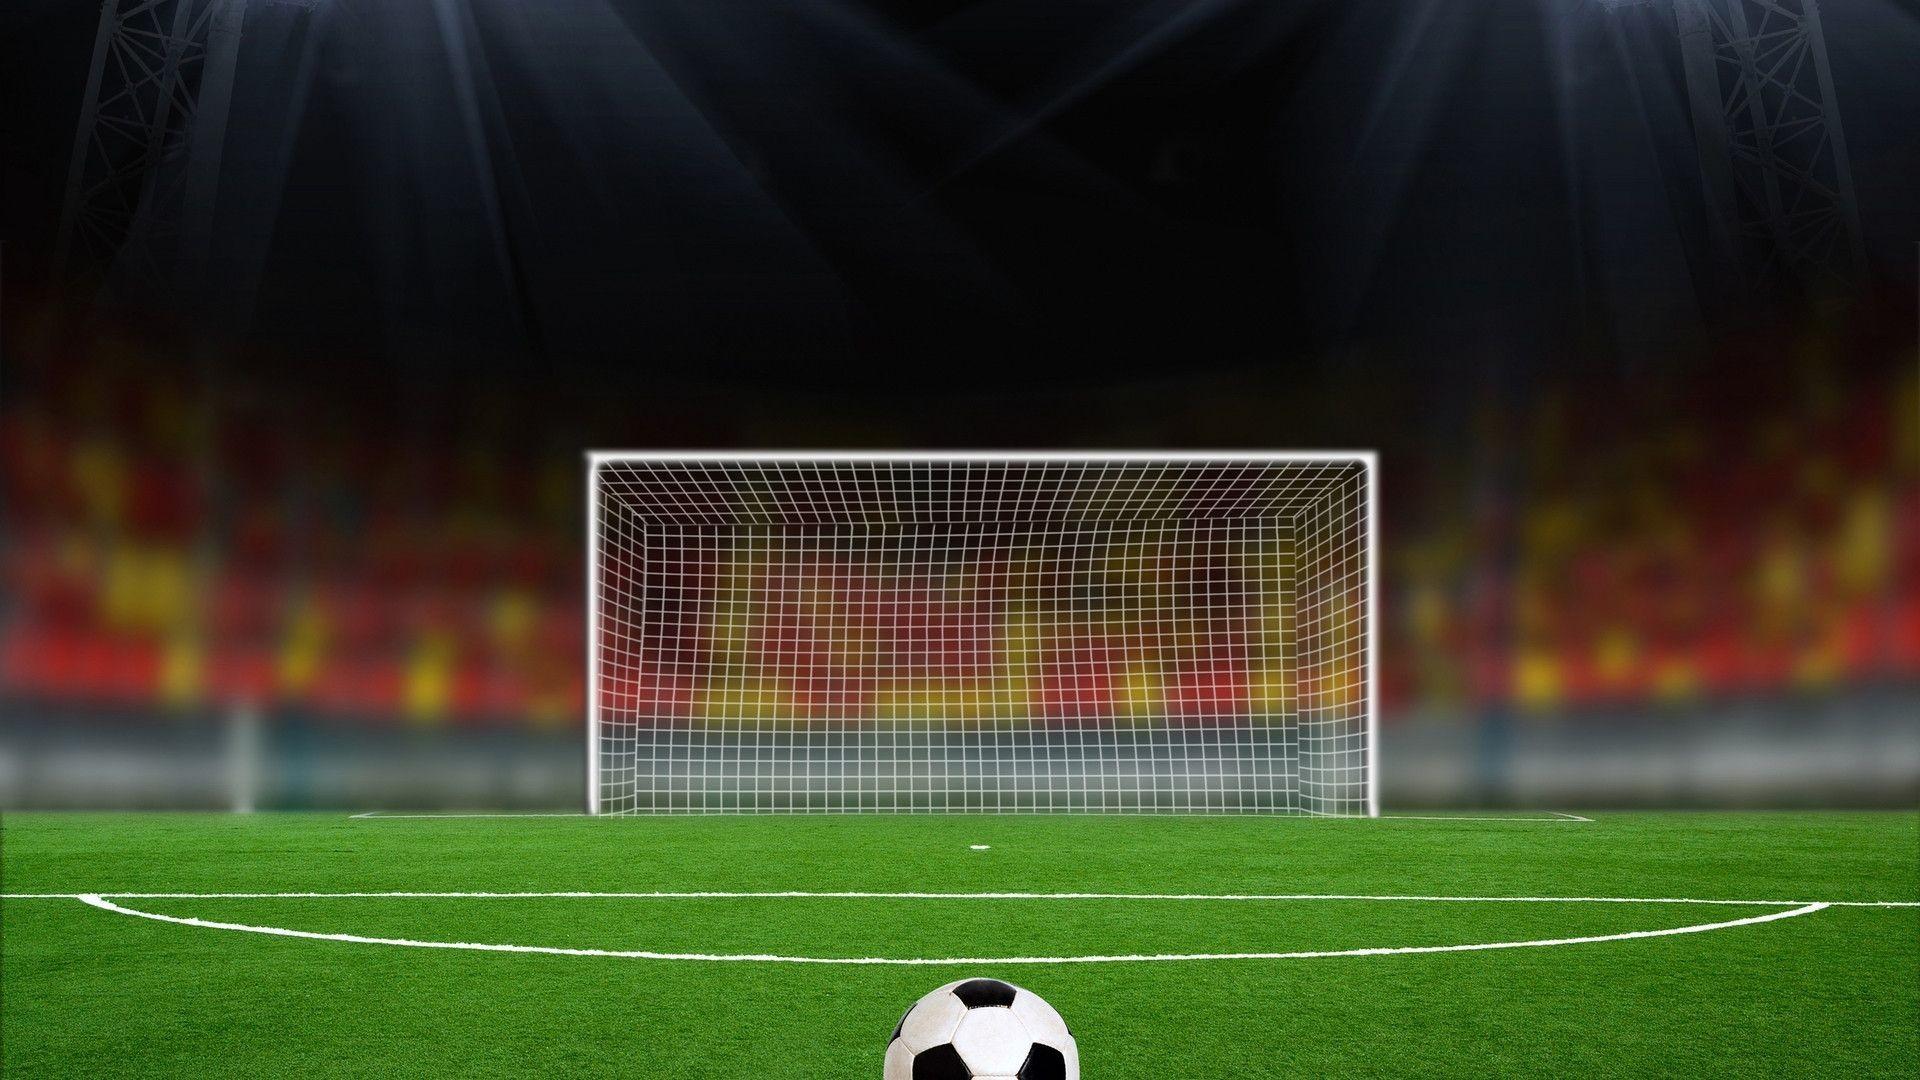 soccer goal wallpaper, wallpapers soccer players